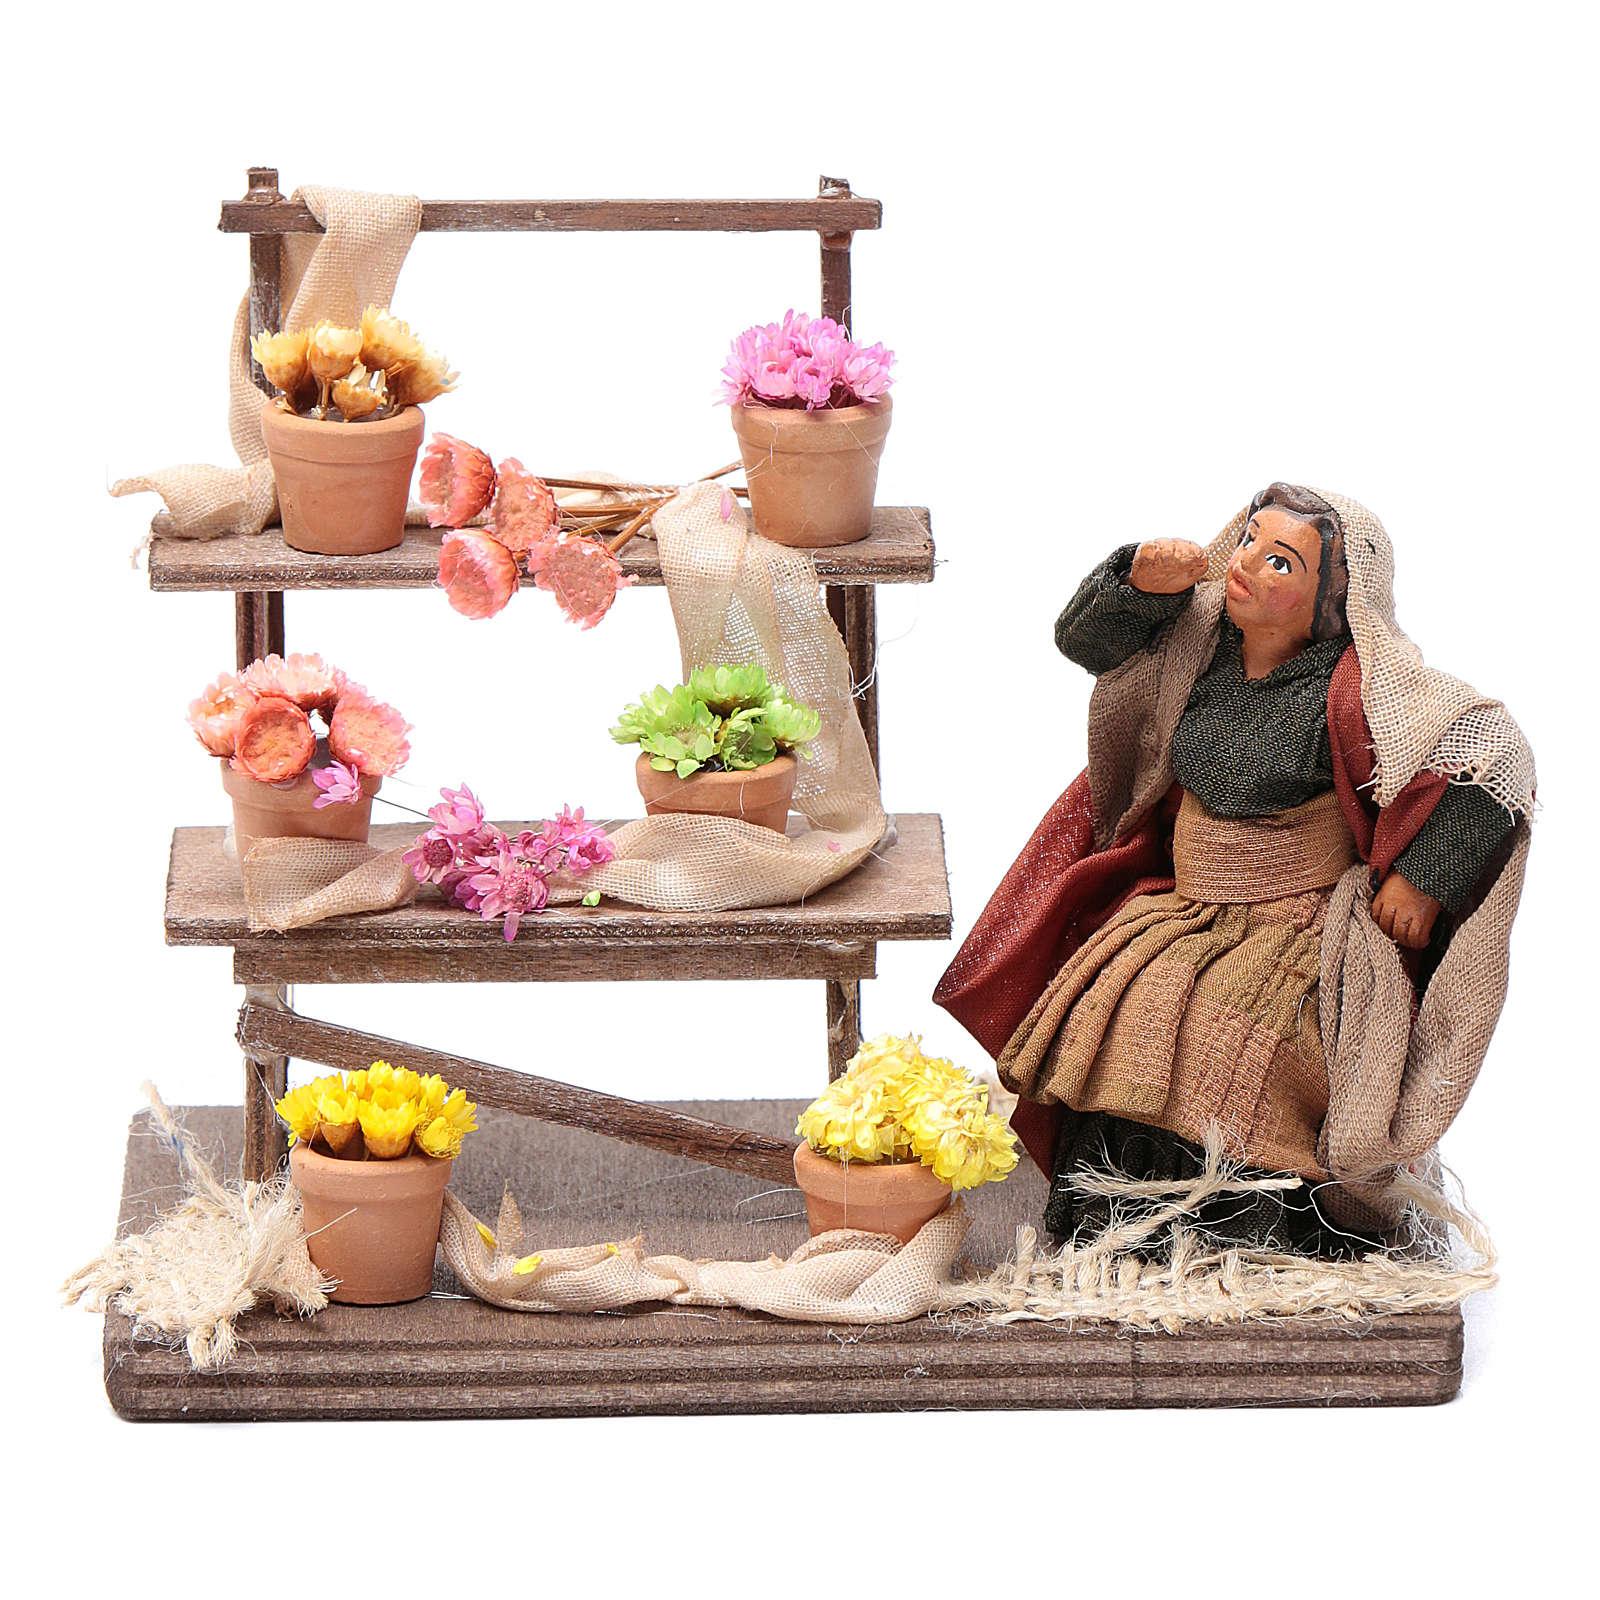 Neapolitan nativity scene statue florist with stand 10 cm 4